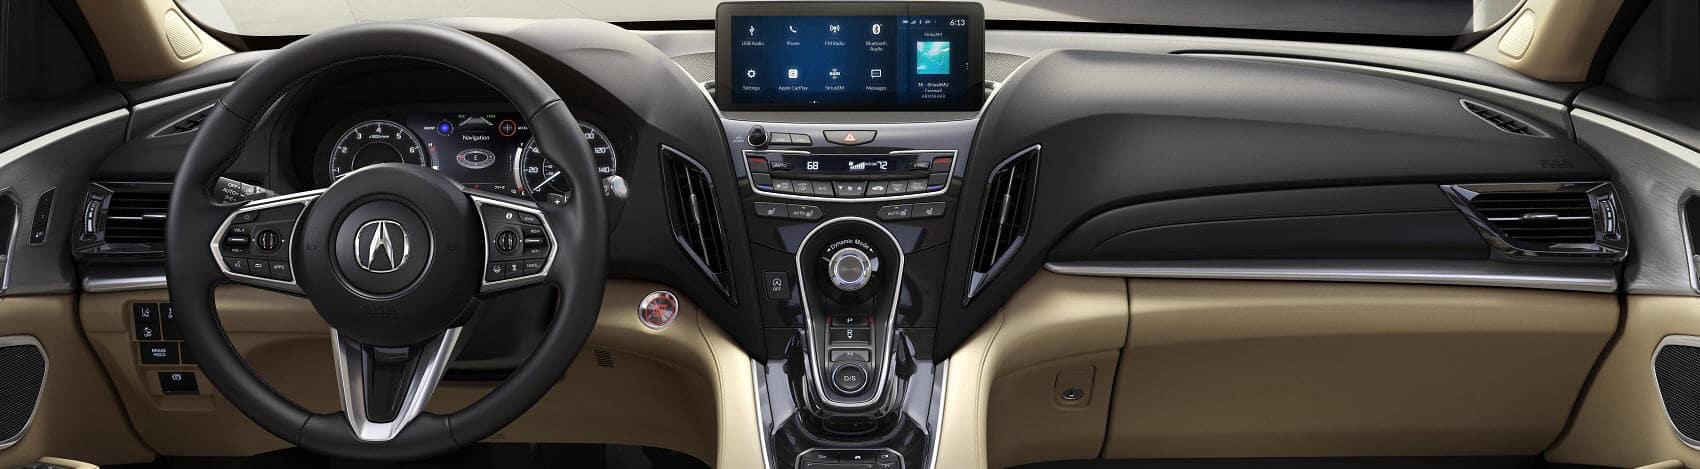 2020 Acura RDX Interior Technology